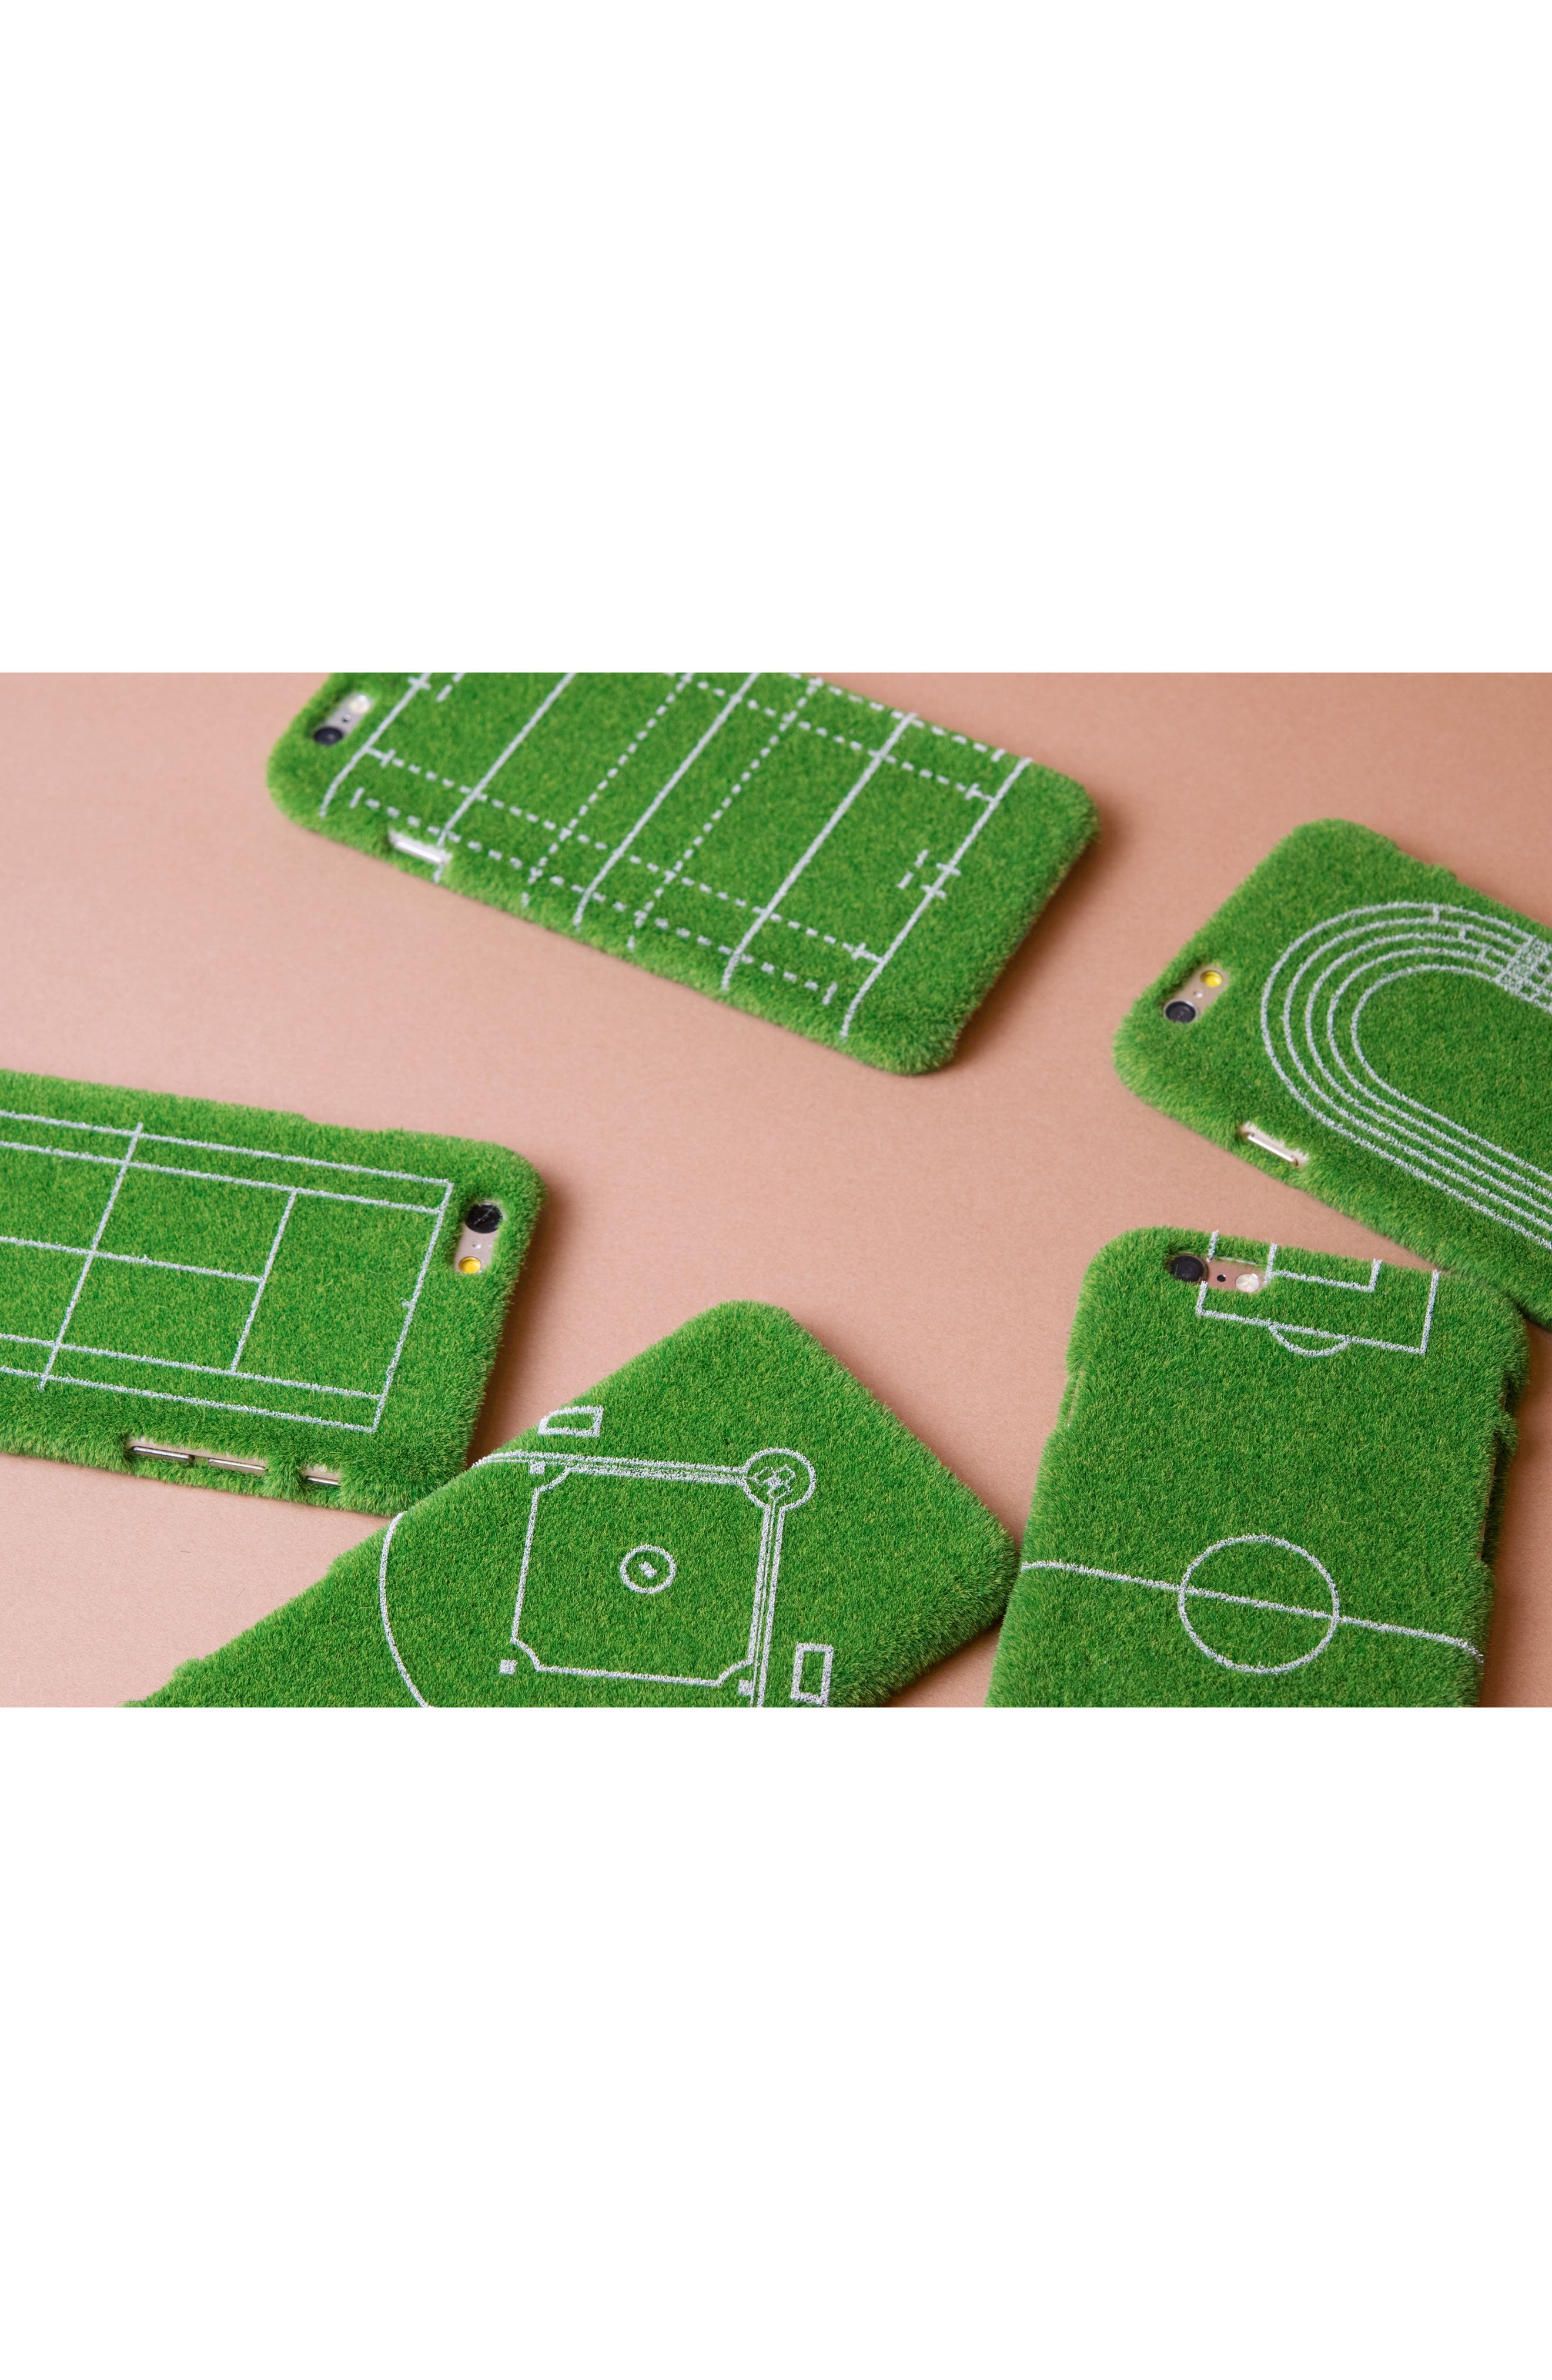 Alternate Image 3  - Shibaful Super Bowl Portable Park iPhone 7 & iPhone 7 Plus Case